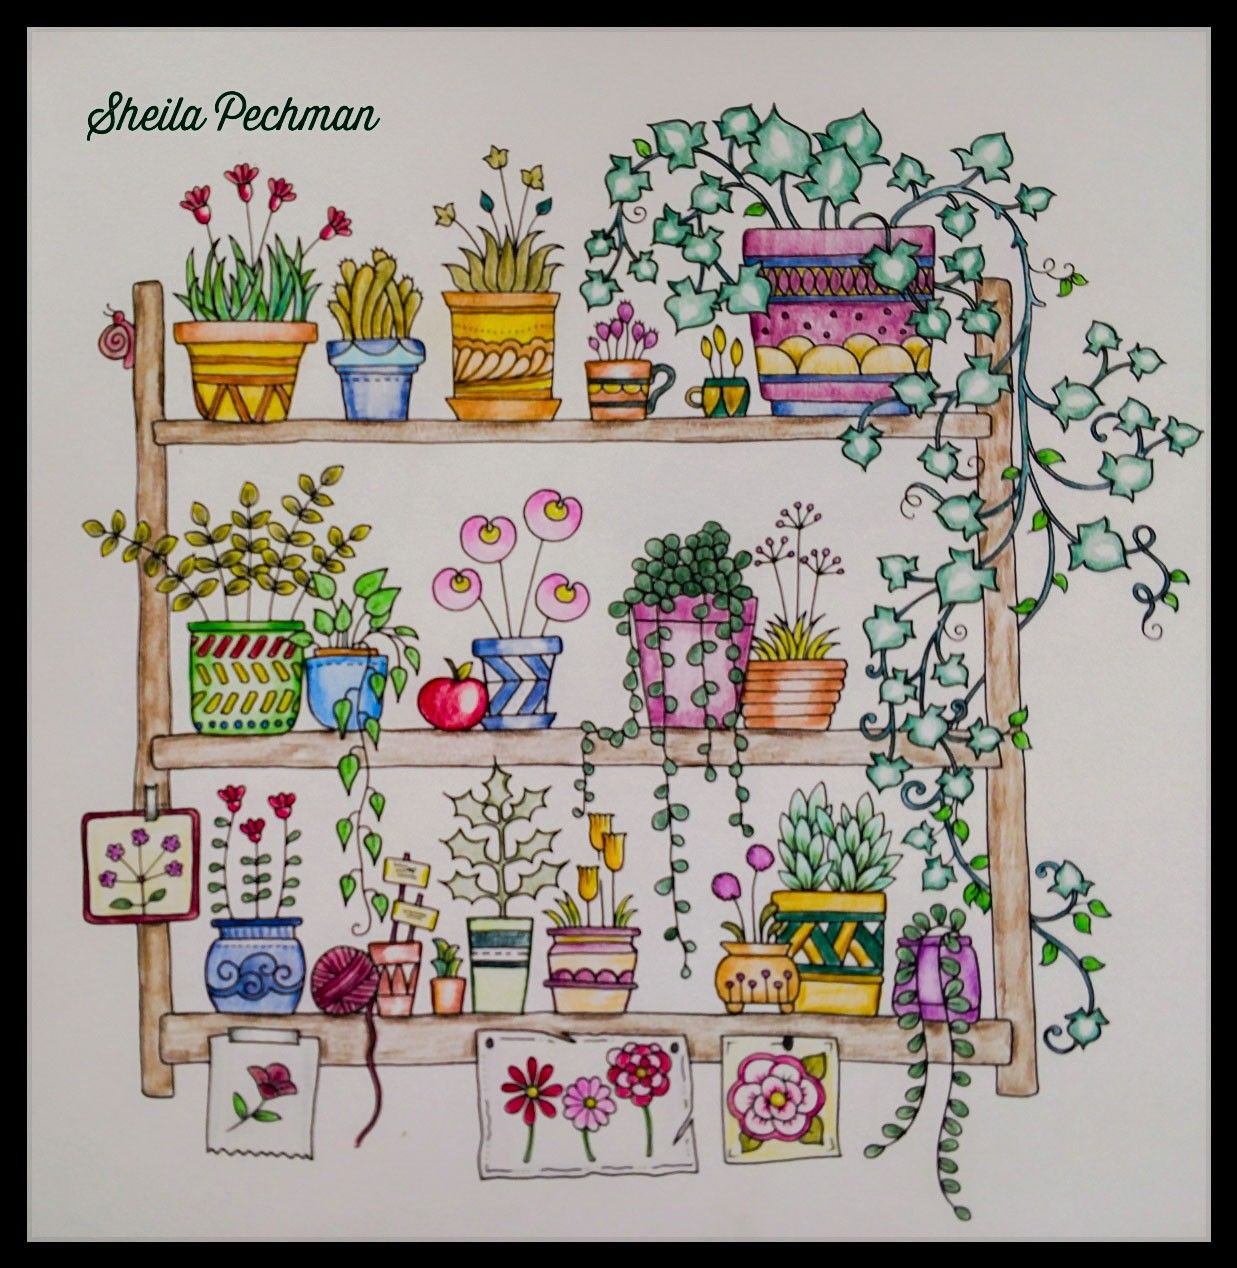 - World Of Flowers Johanna Basford Artist November 4, 2018 Johanna